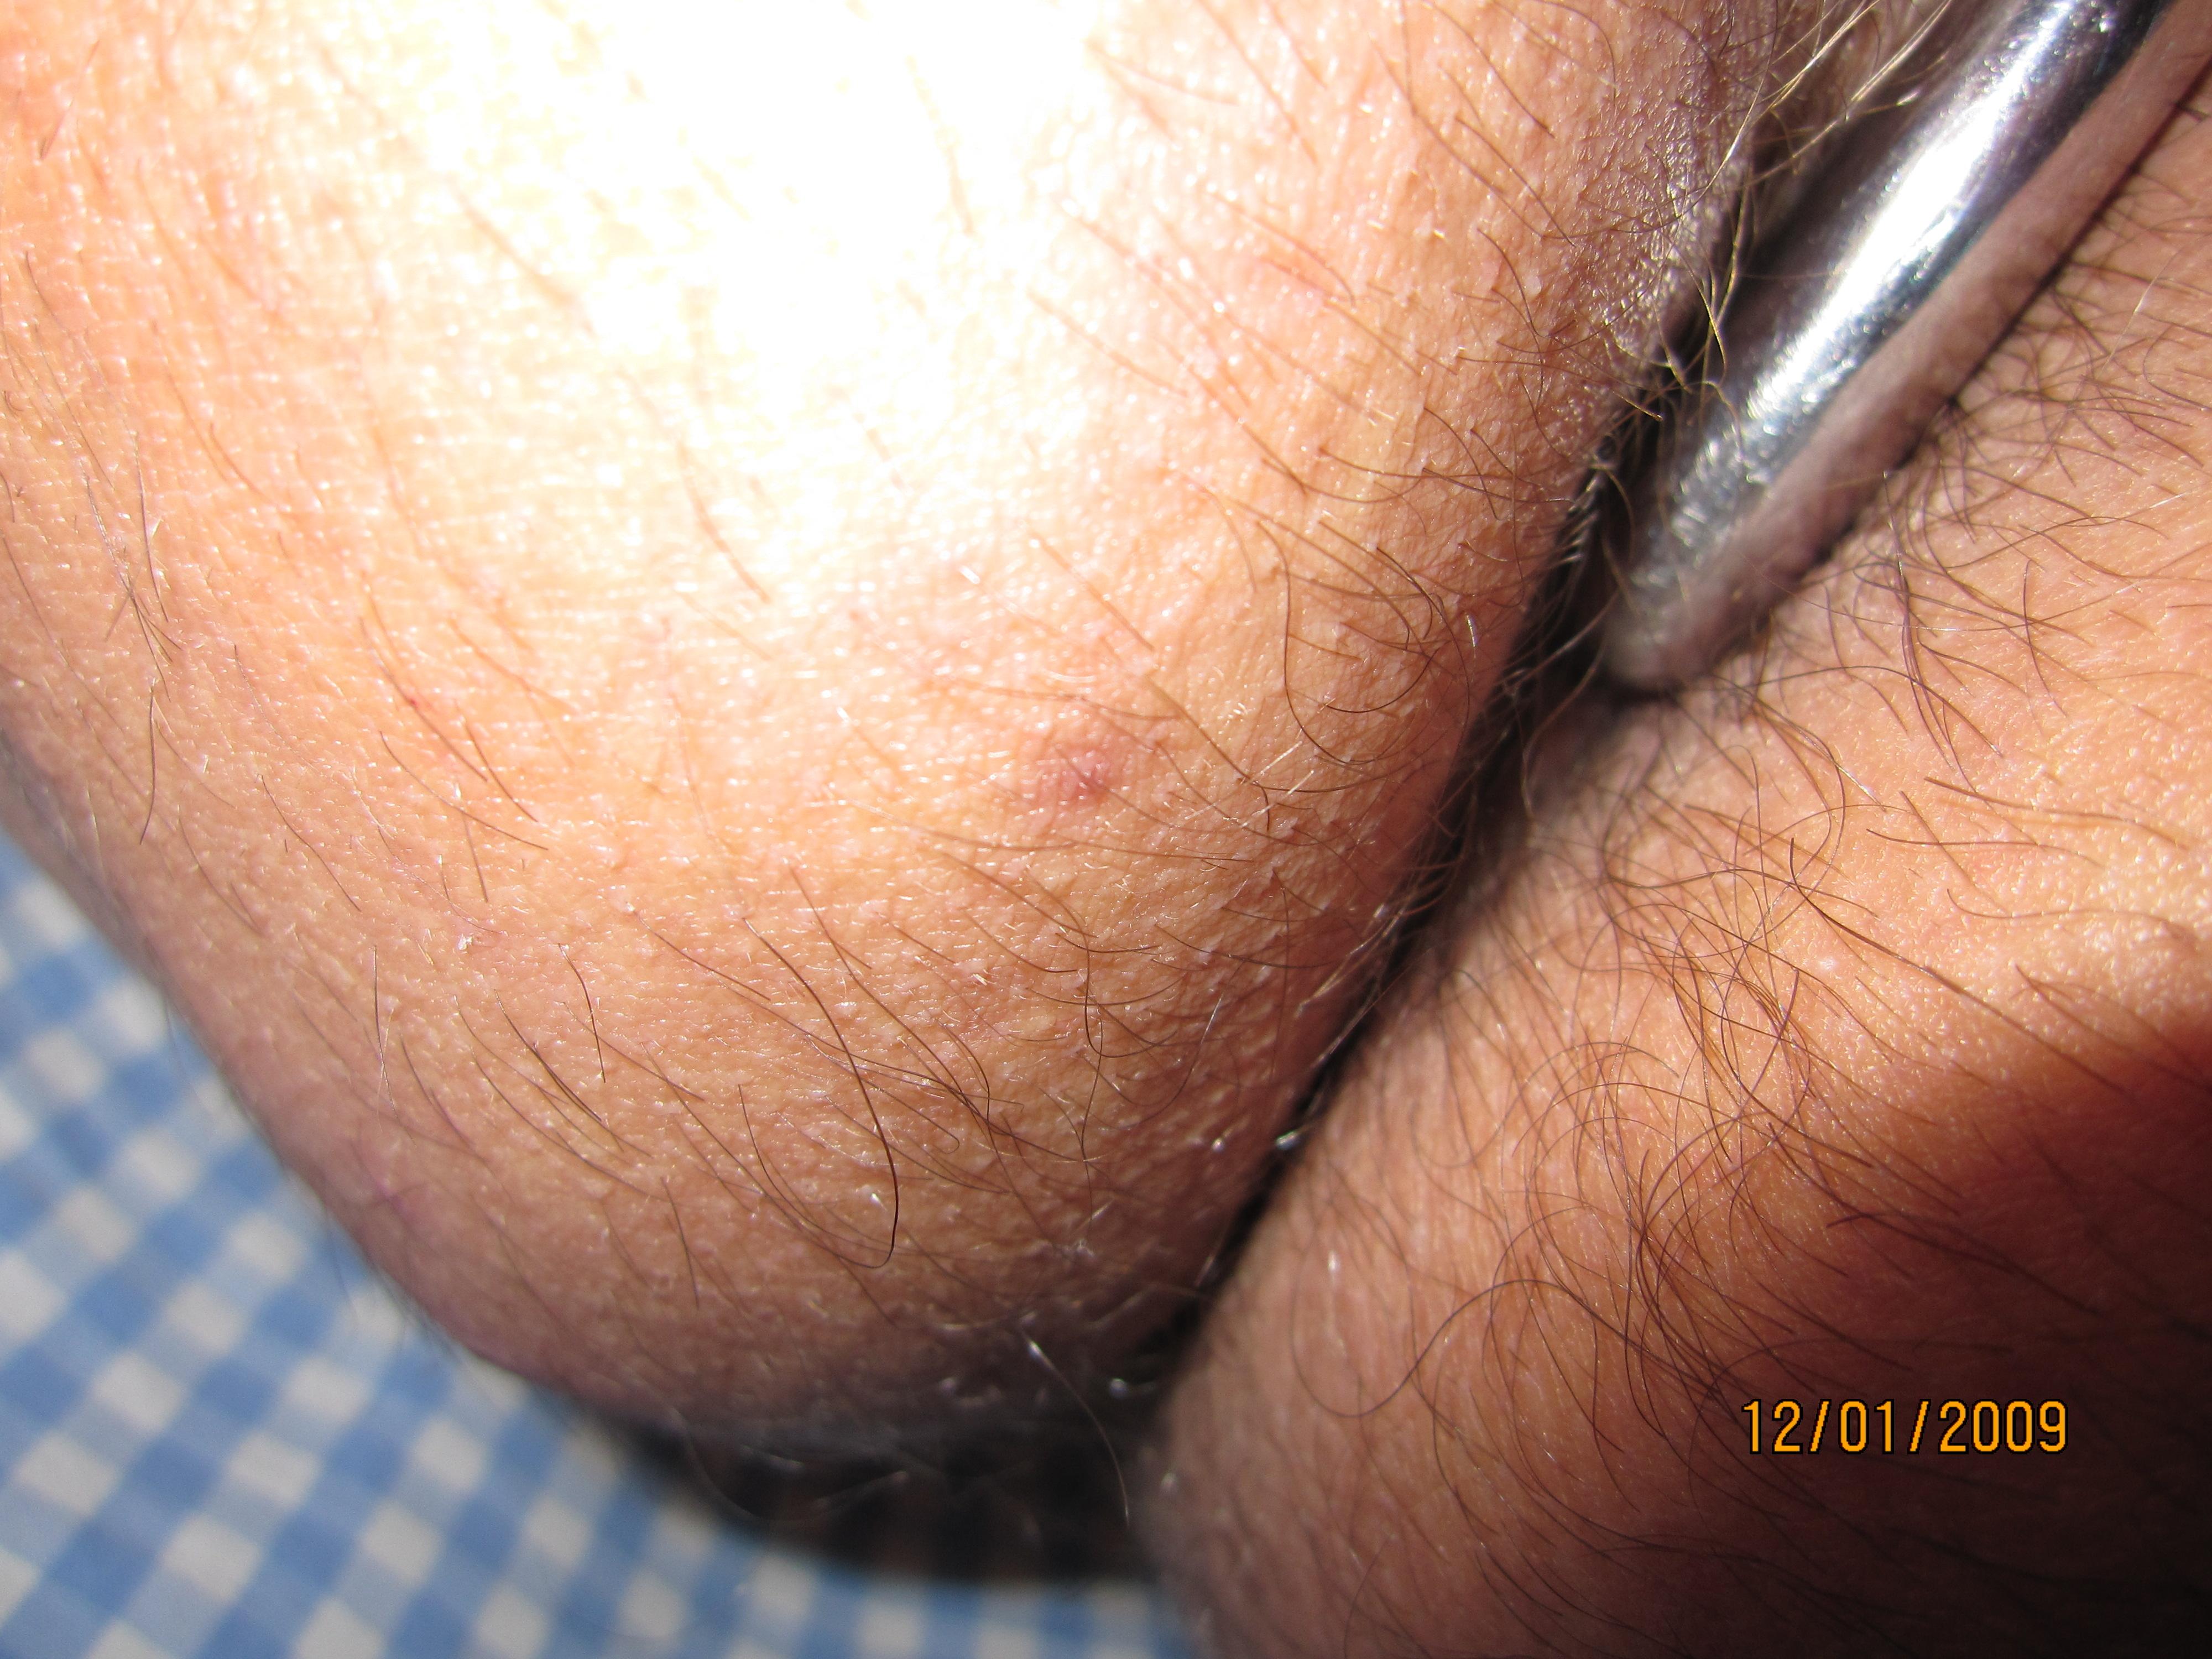 isobignuts